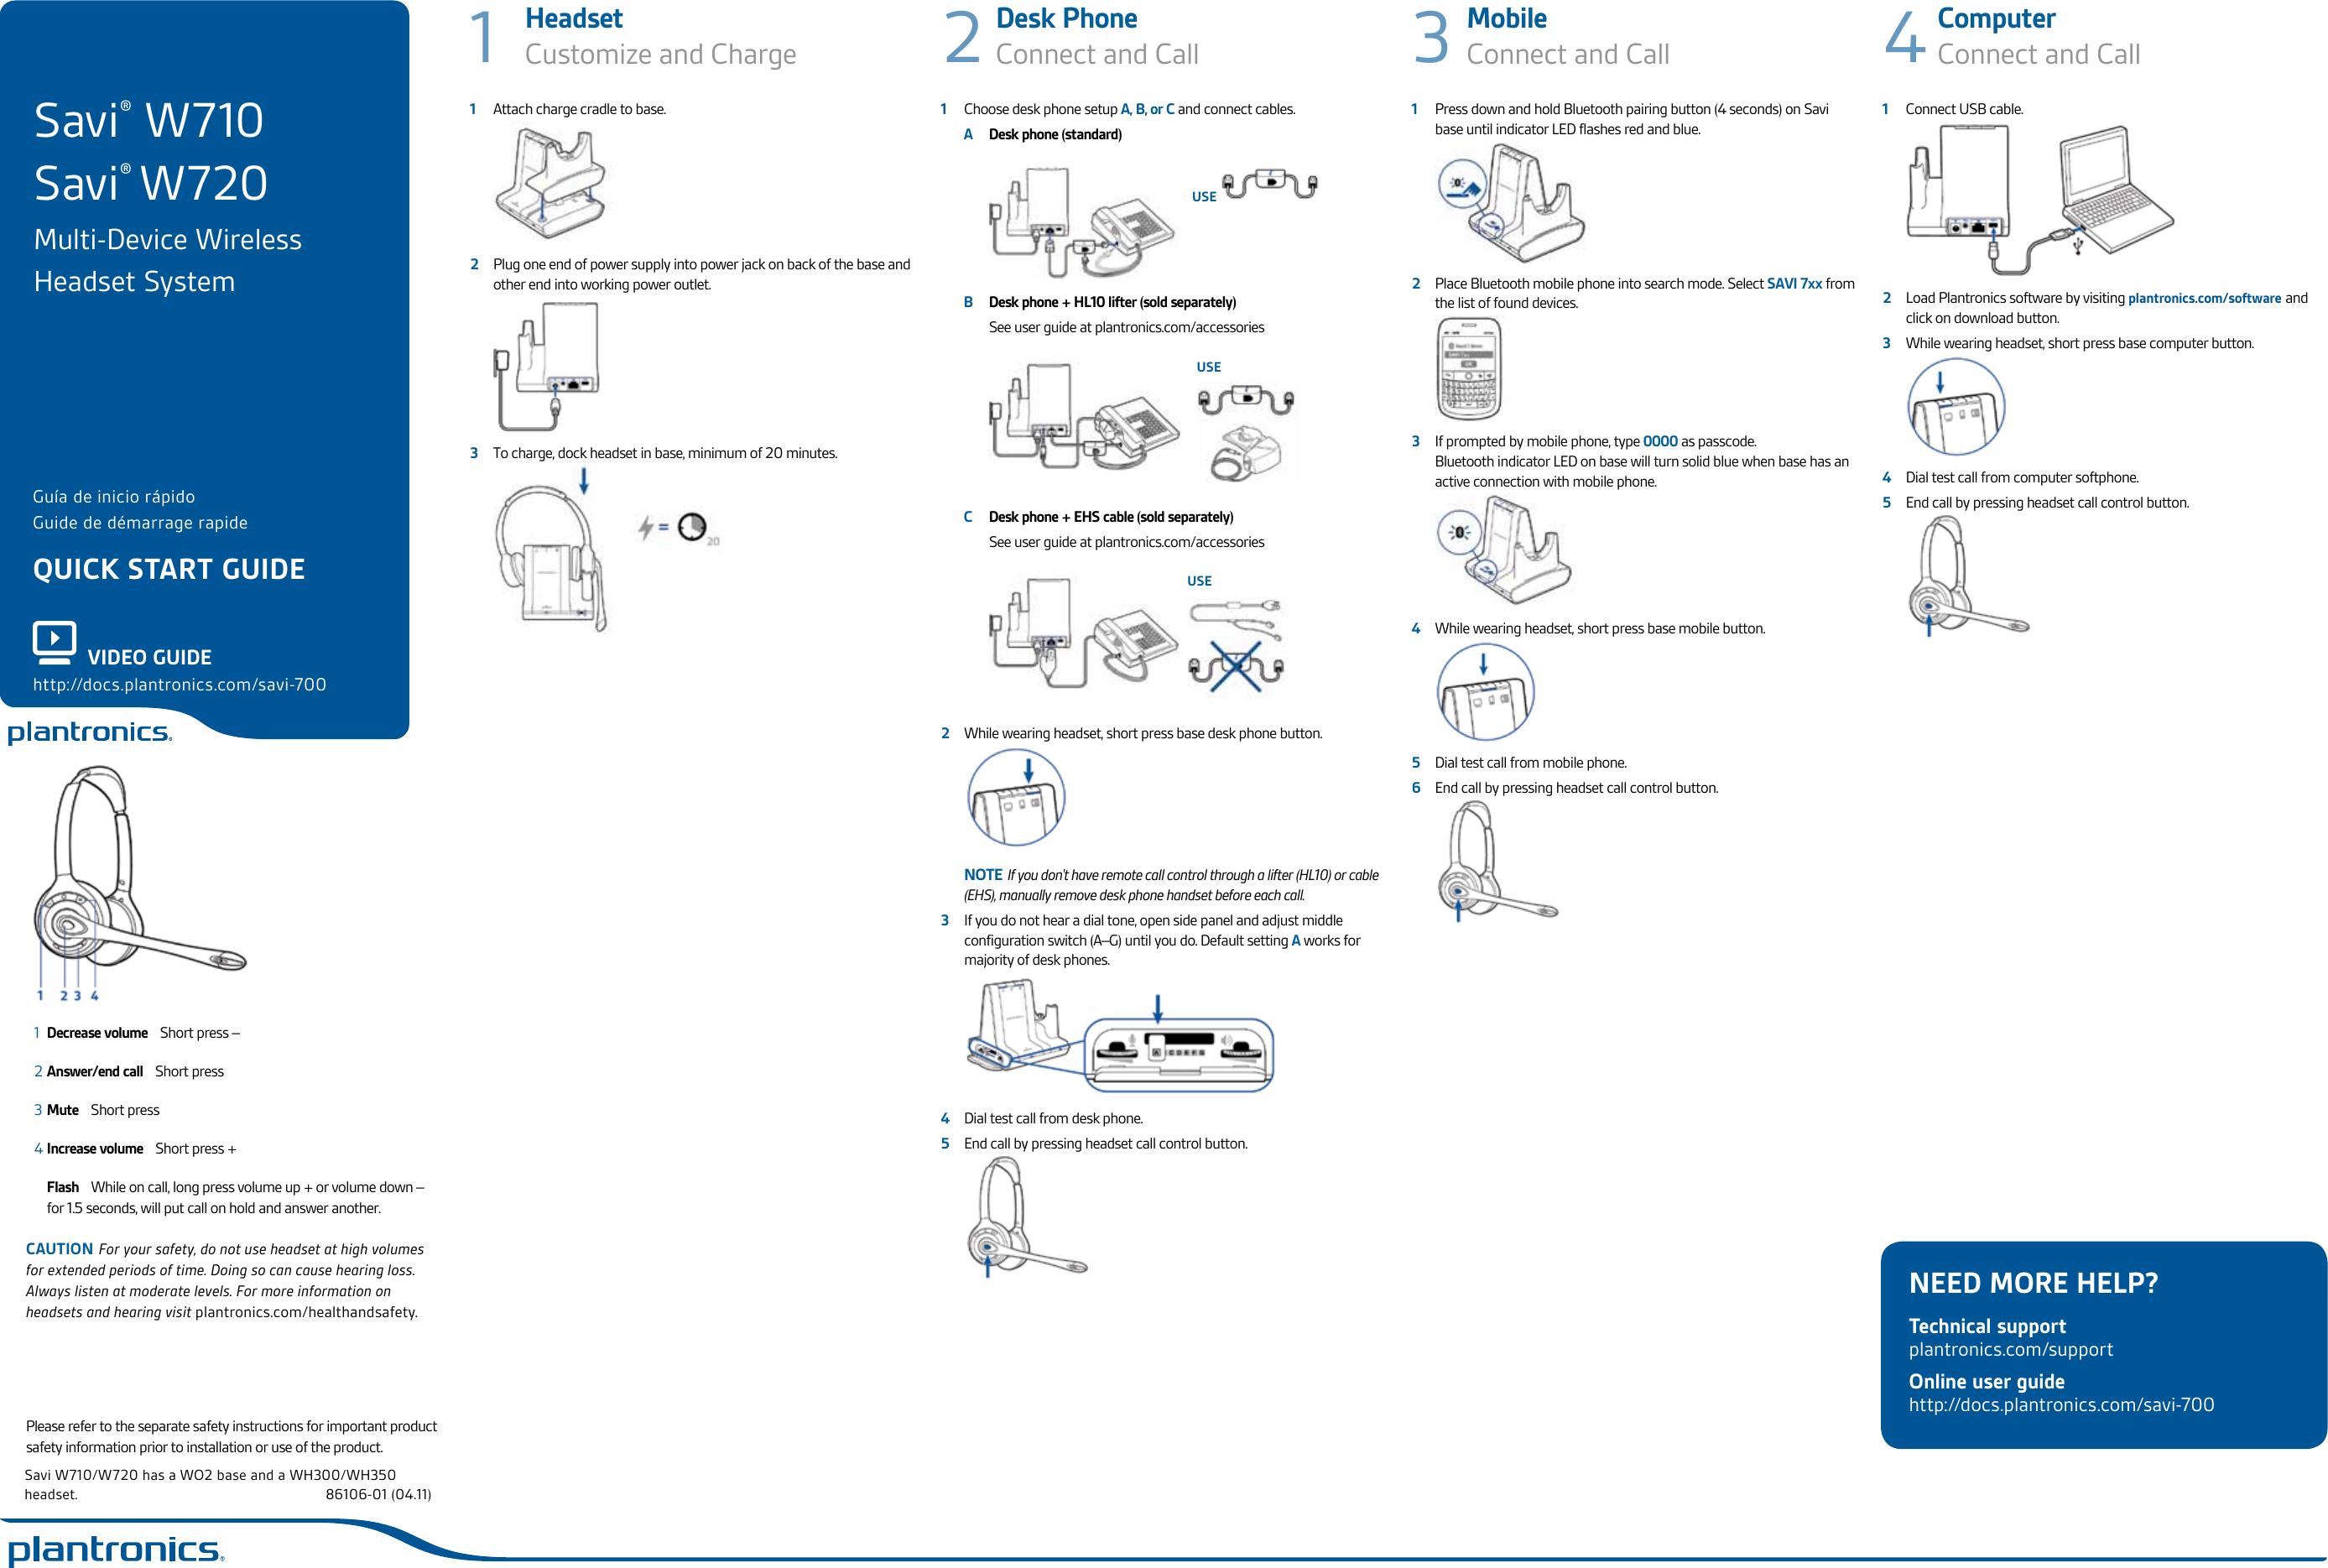 Plantronics Bluetooth Headset W710 Users Manual